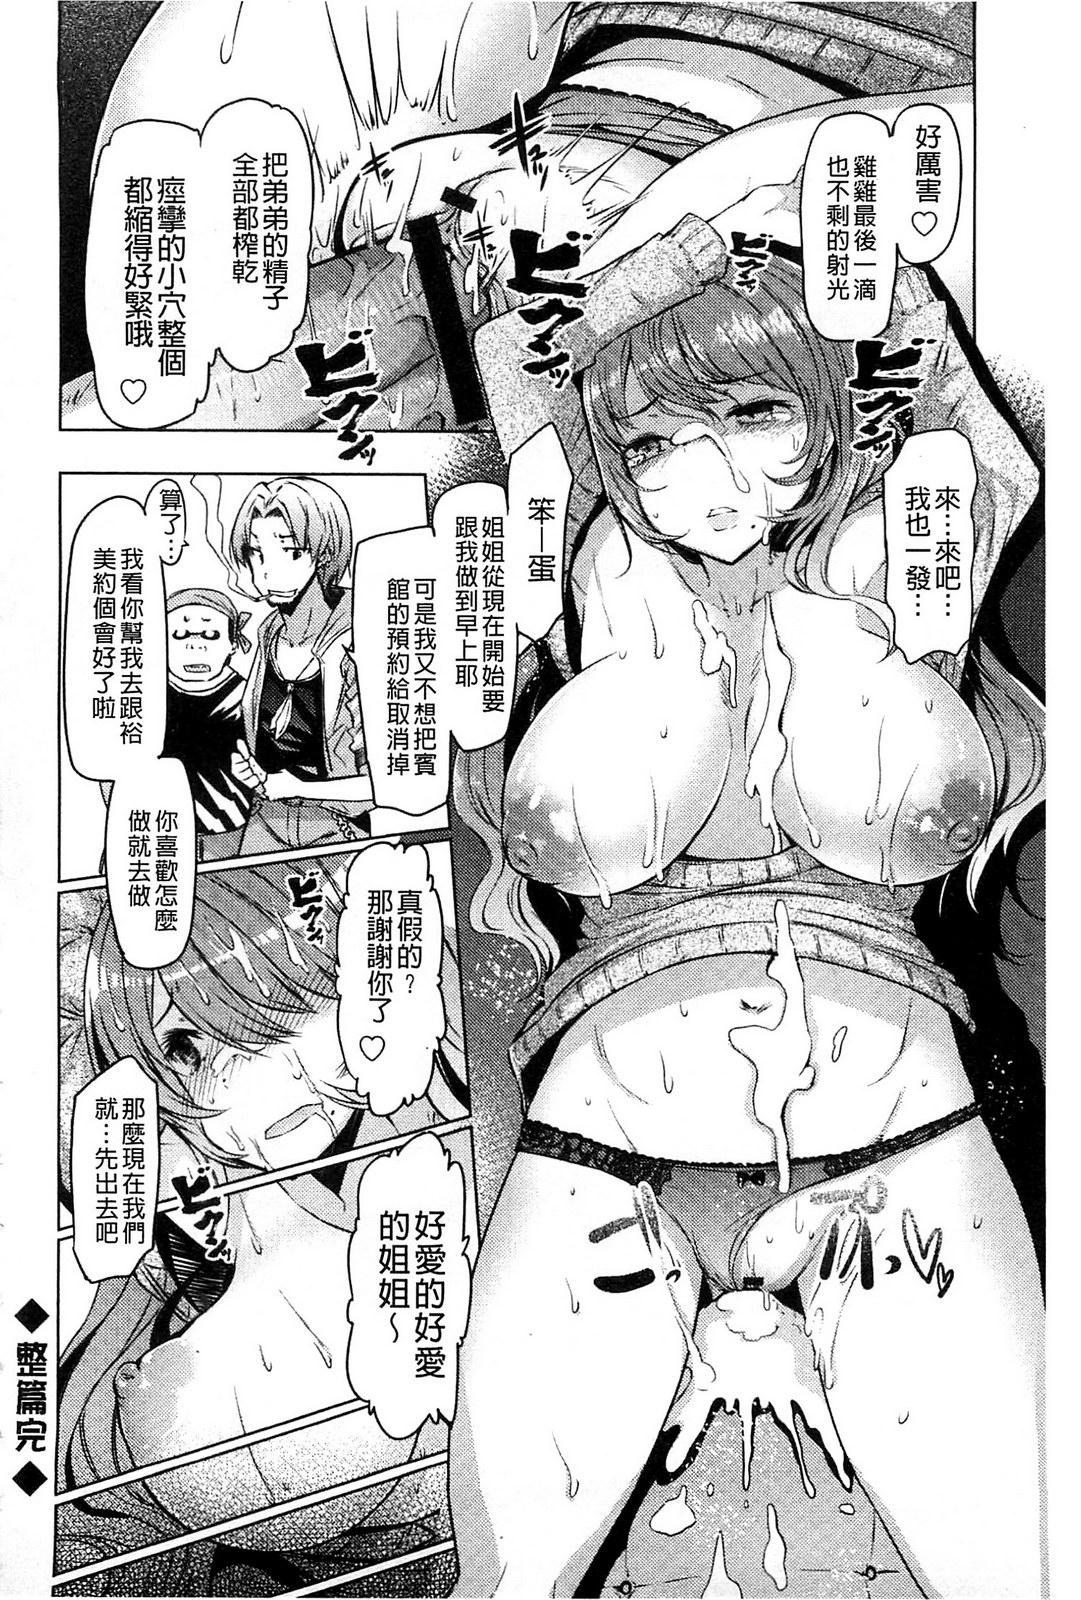 Imouto Kansatsu Nikki - The Record of Sex with My Sister 204